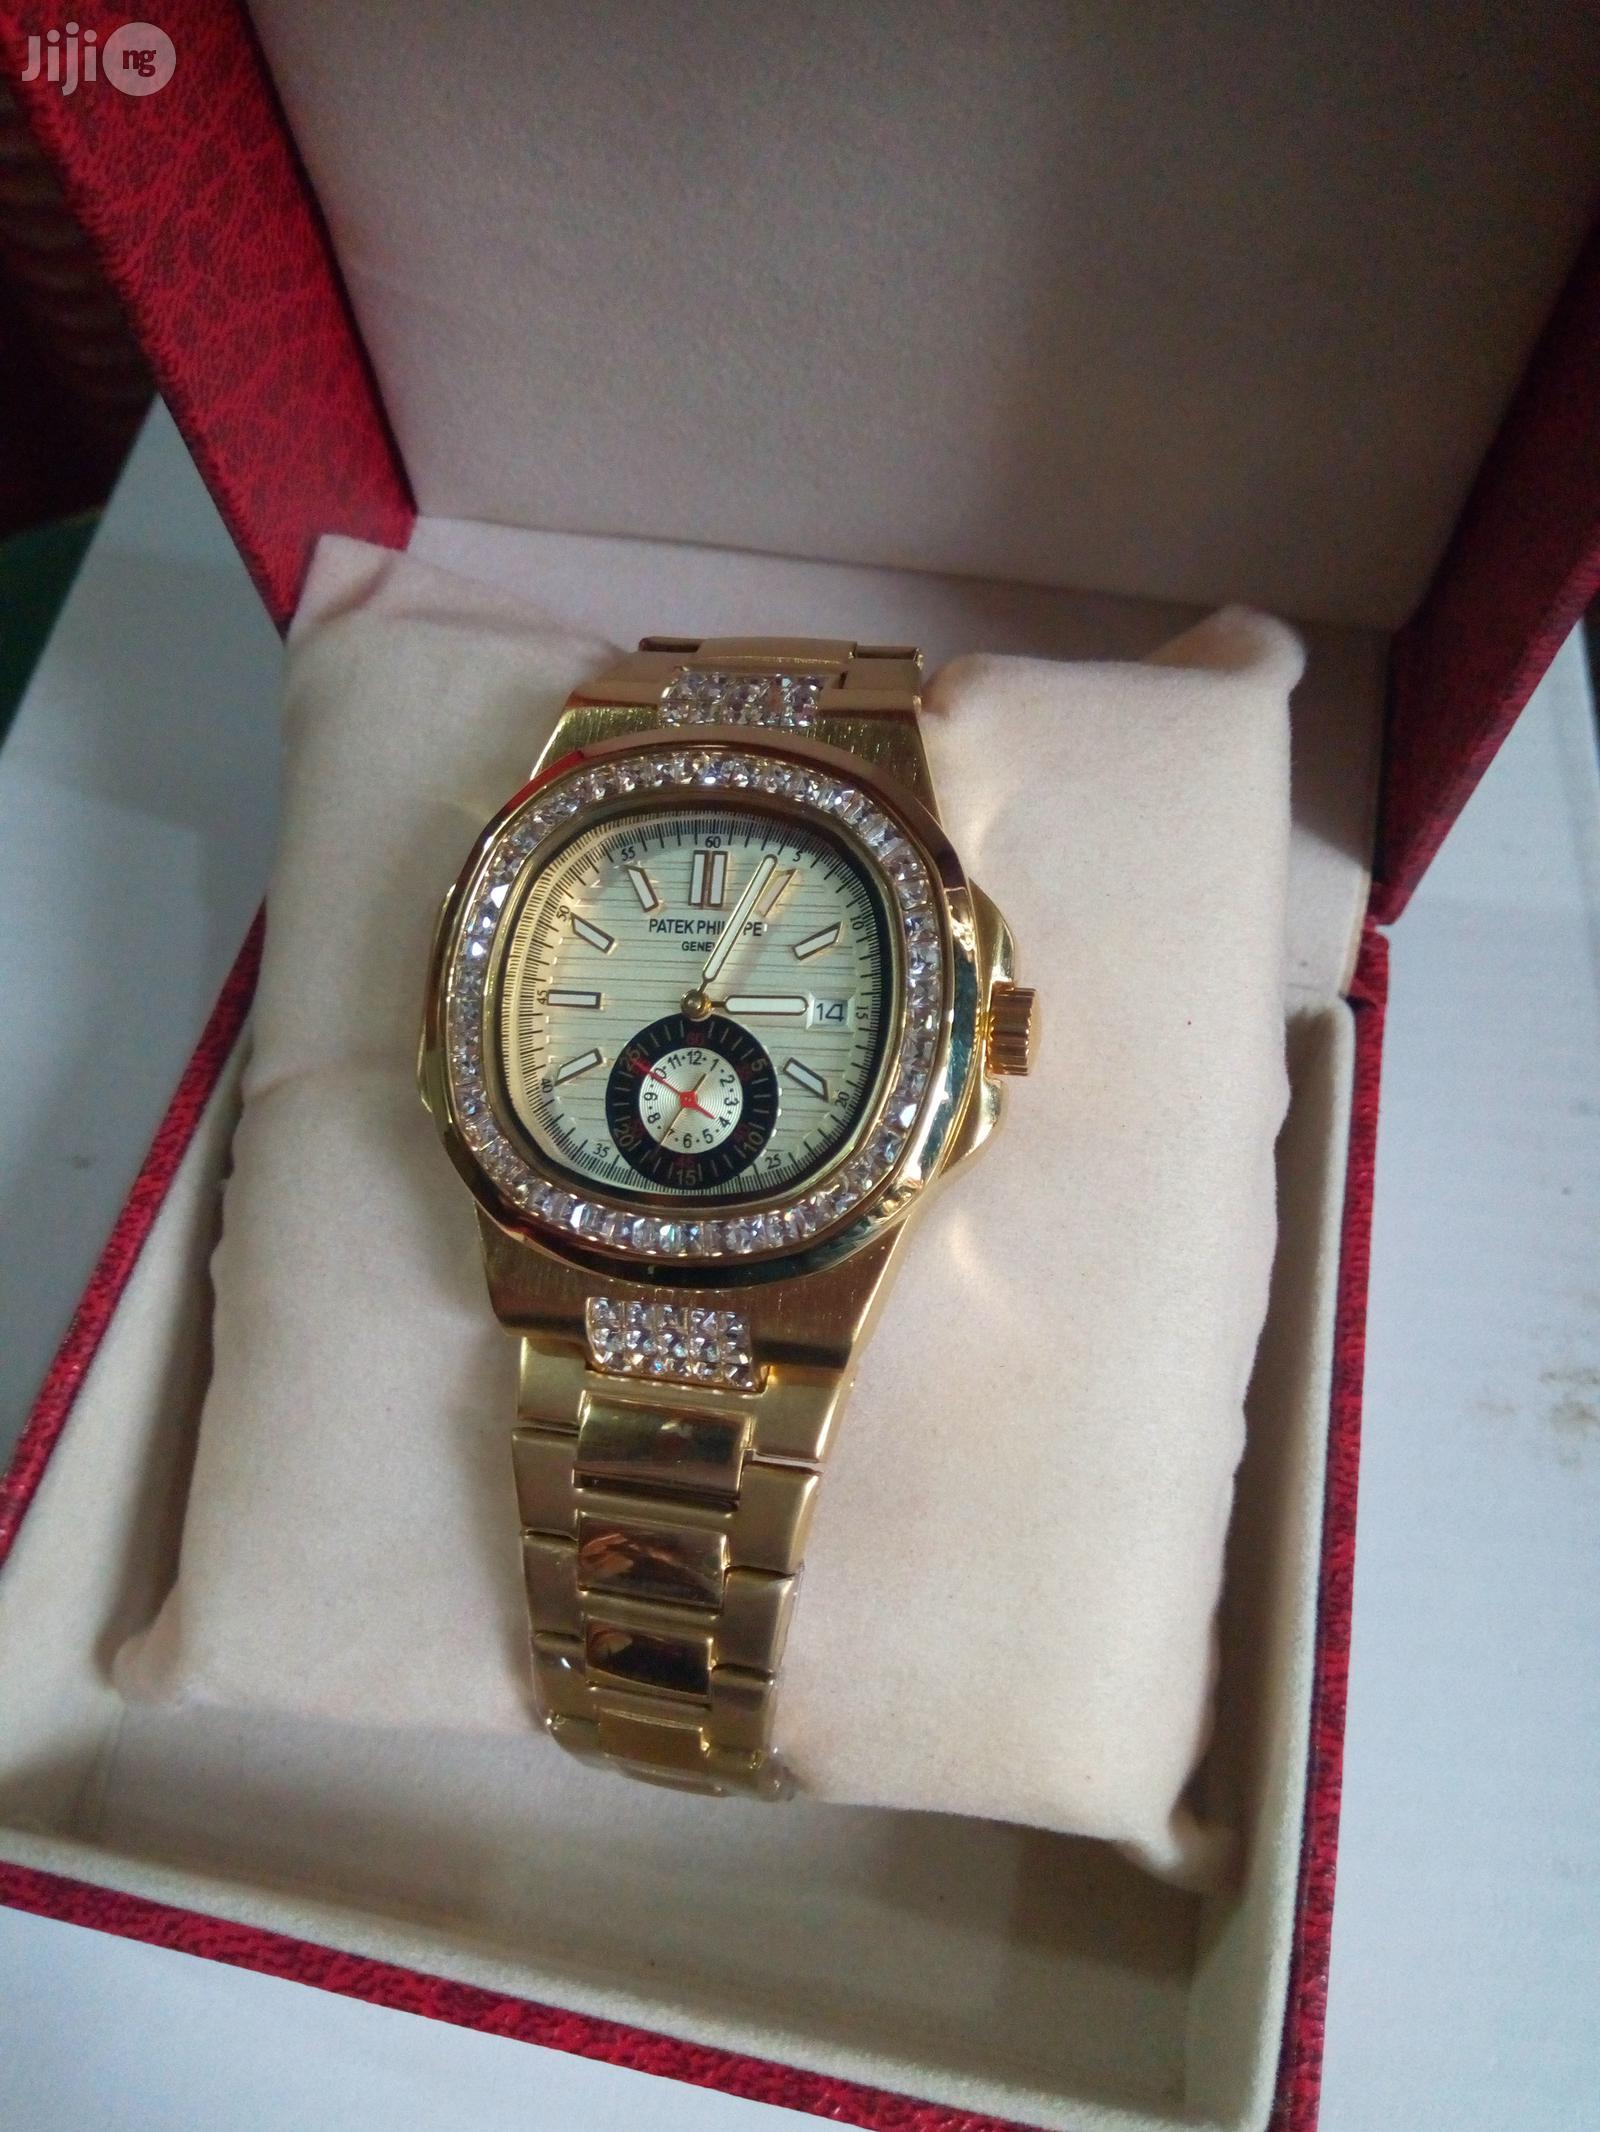 Men's Patek Philippe Wrist Watch | Watches for sale in Ikeja, Lagos State, Nigeria